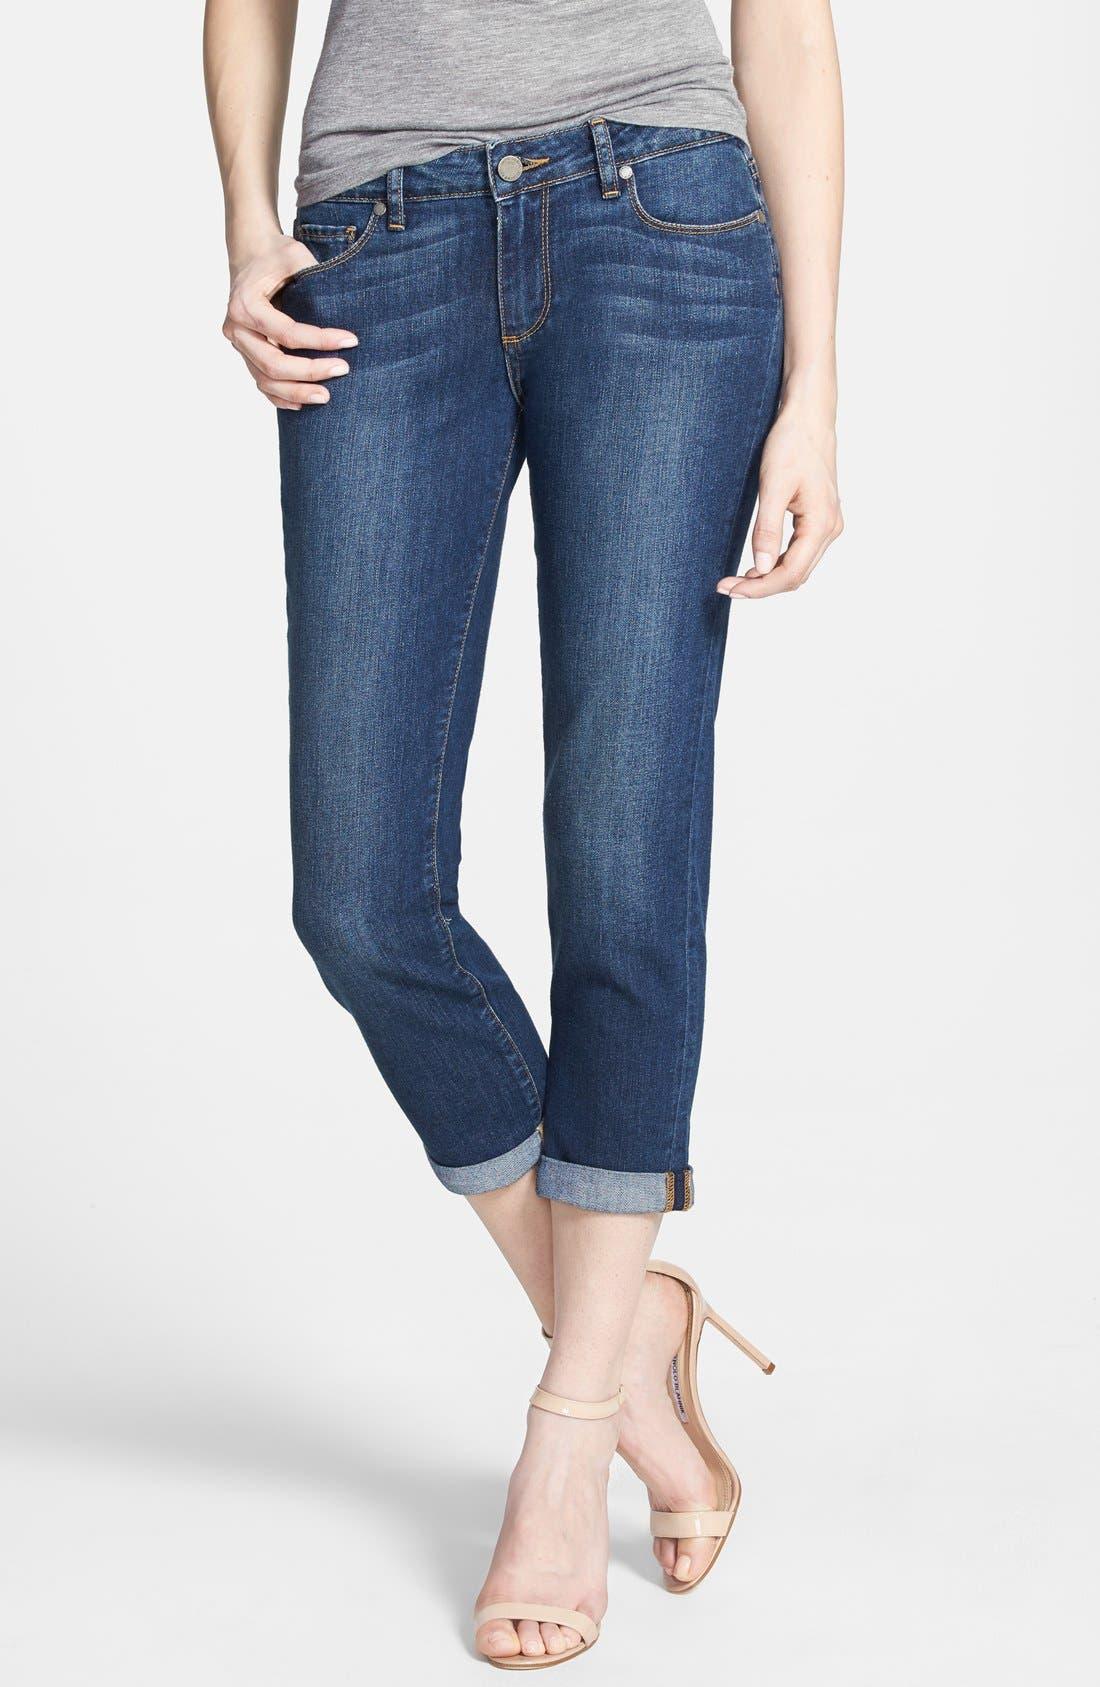 Alternate Image 1 Selected - Paige Denim 'Jimmy Jimmy' Crop Skinny Jeans (Rebecca)